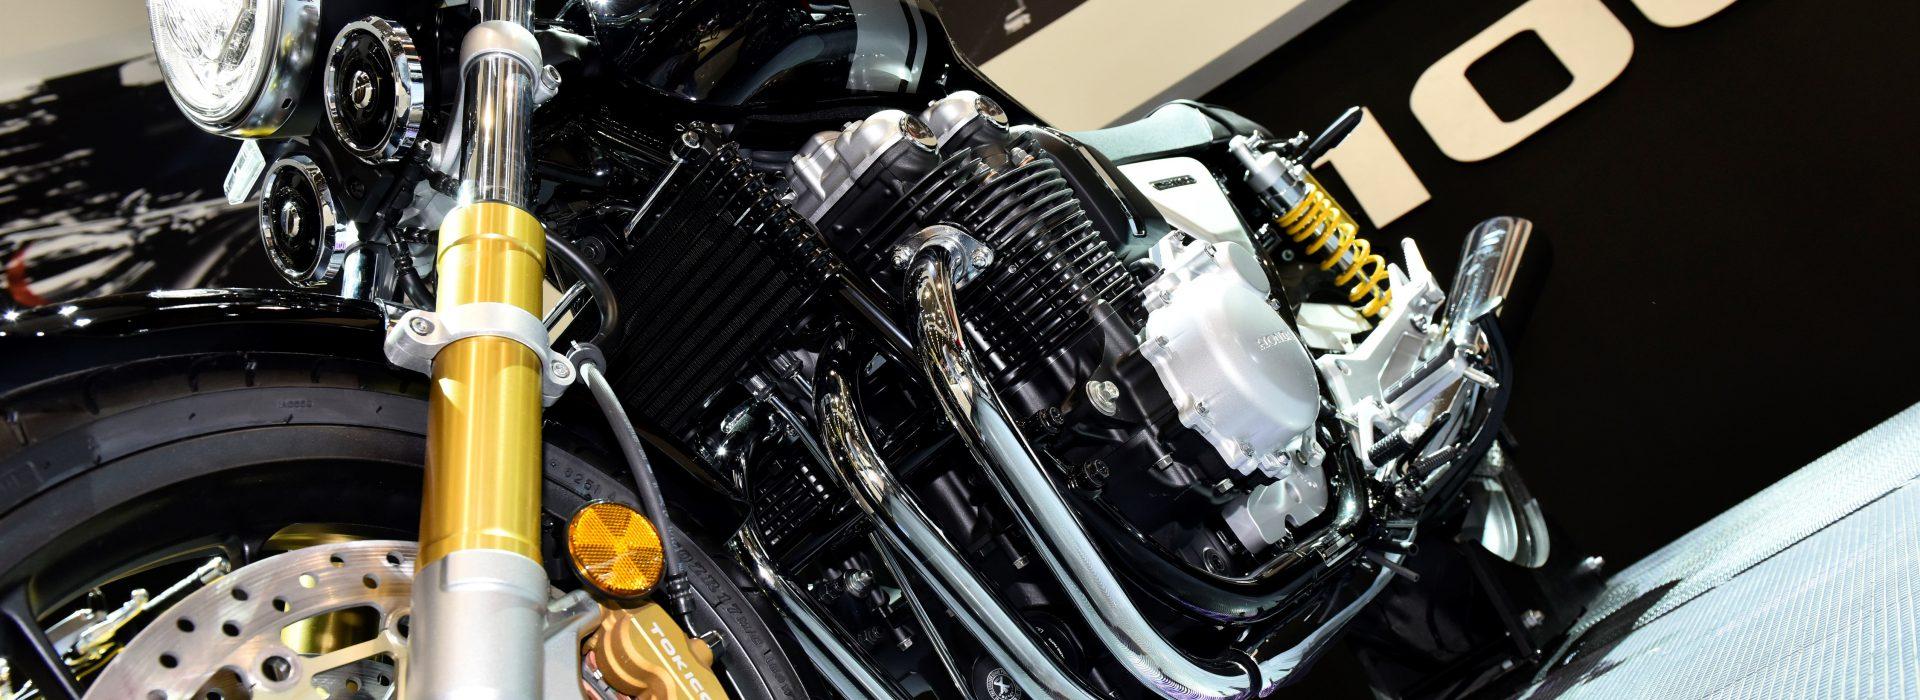 Intermot 2016 - 17YM CB1100 EX/RS